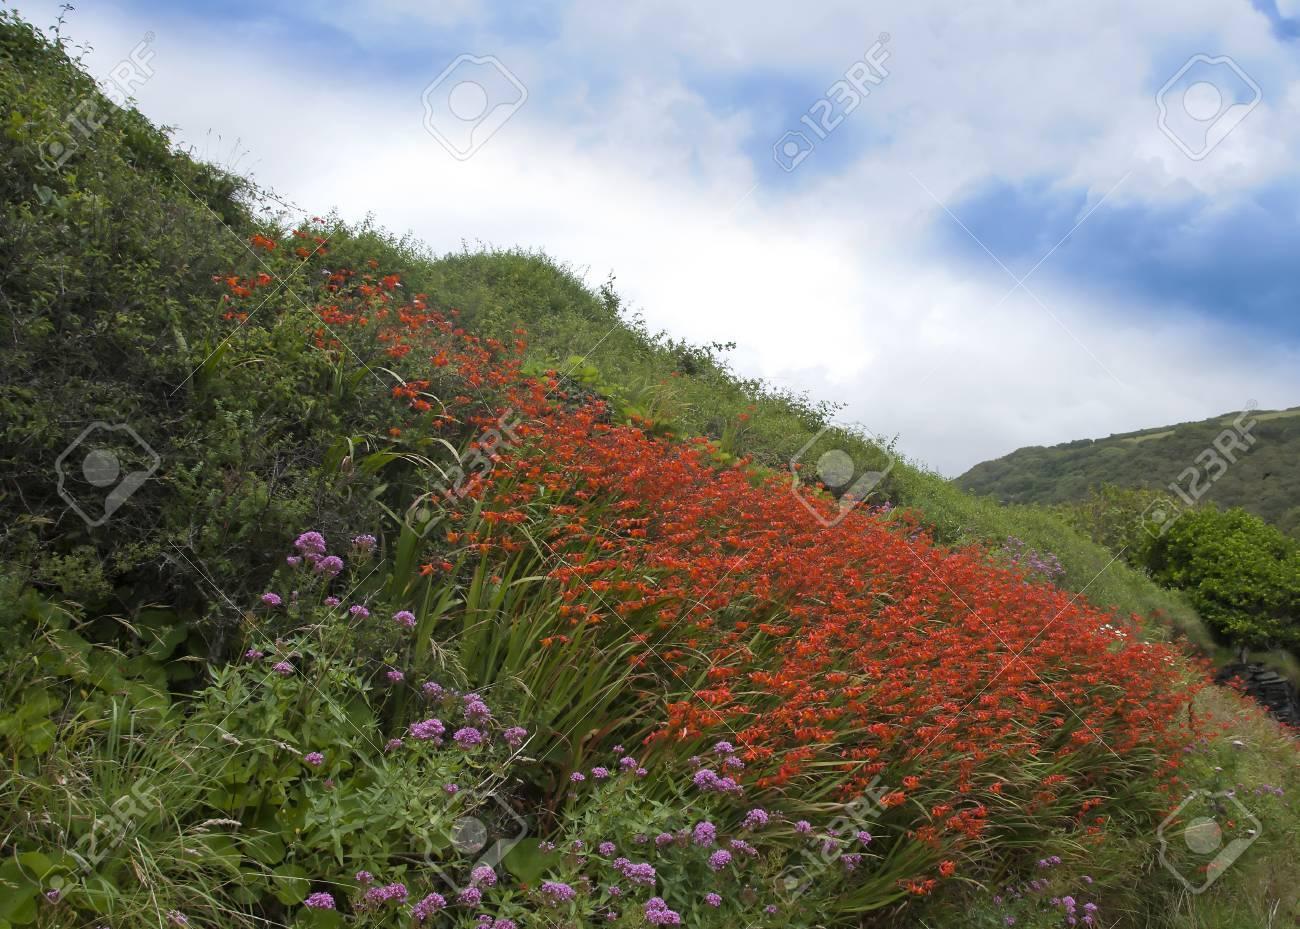 Orange Crocosmia Flowers on a Cornish Hillside Stock Photo - 15490999